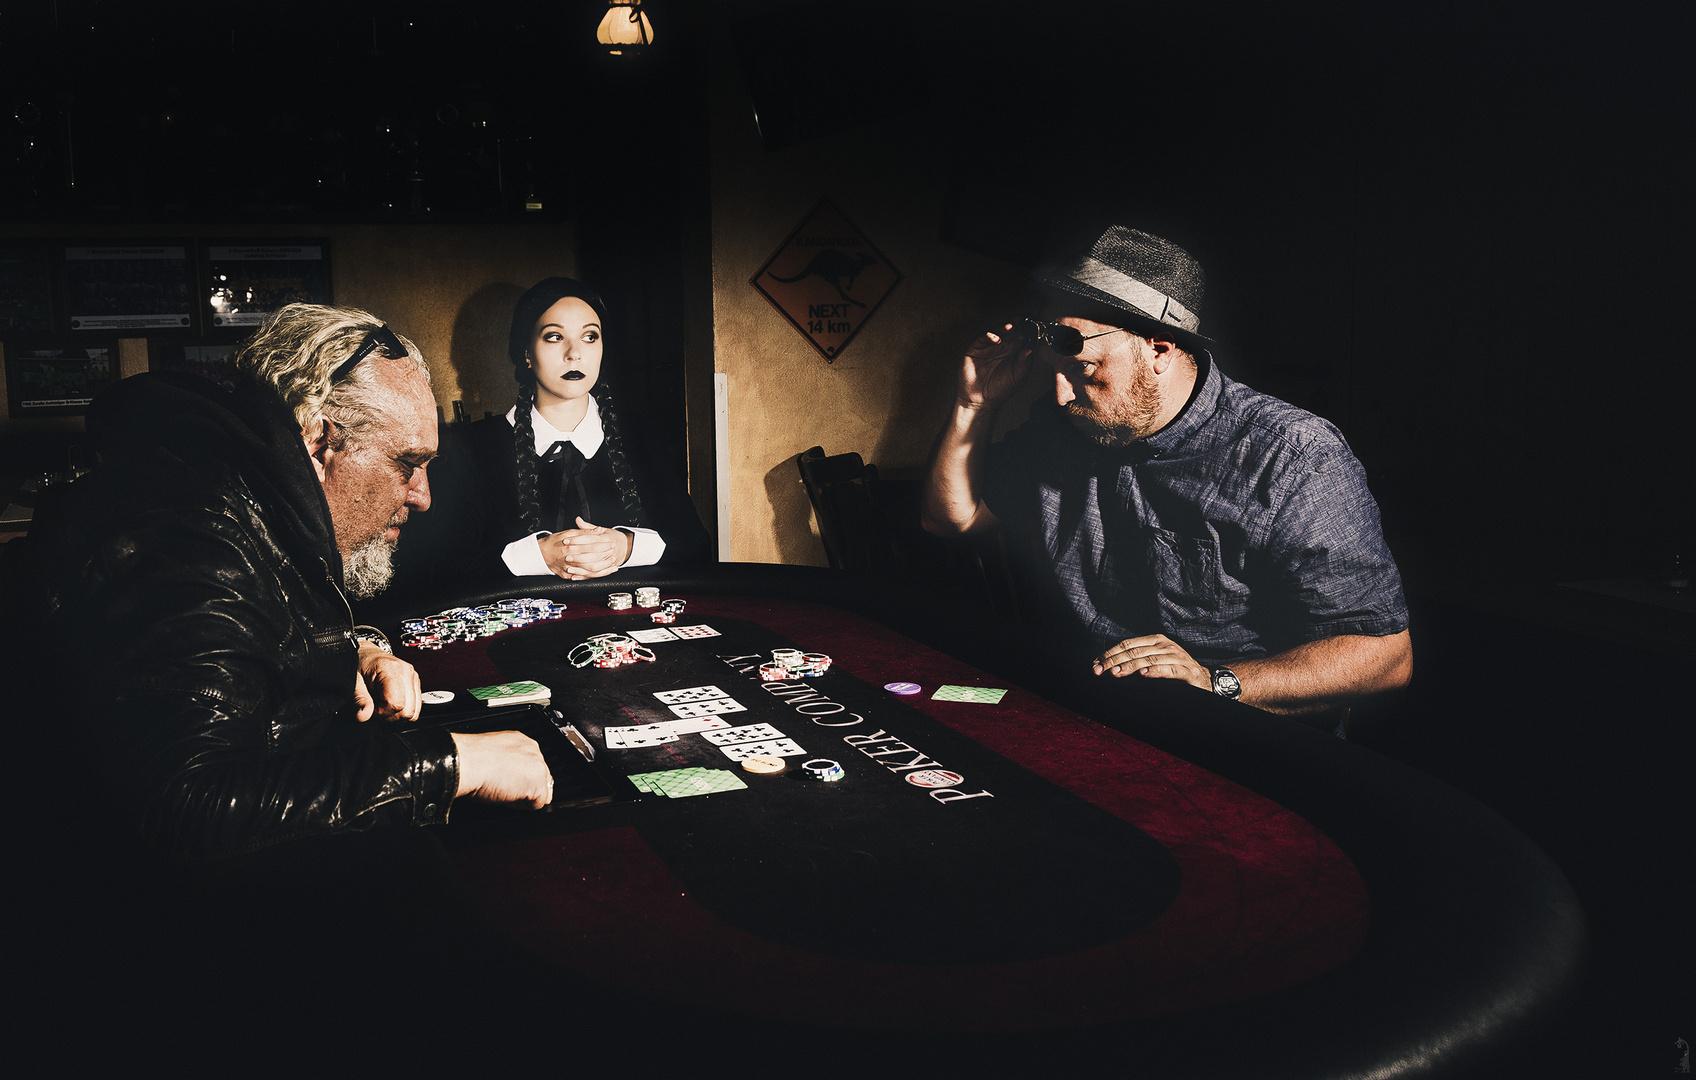 Wednesday Addams Poker Story °2/3